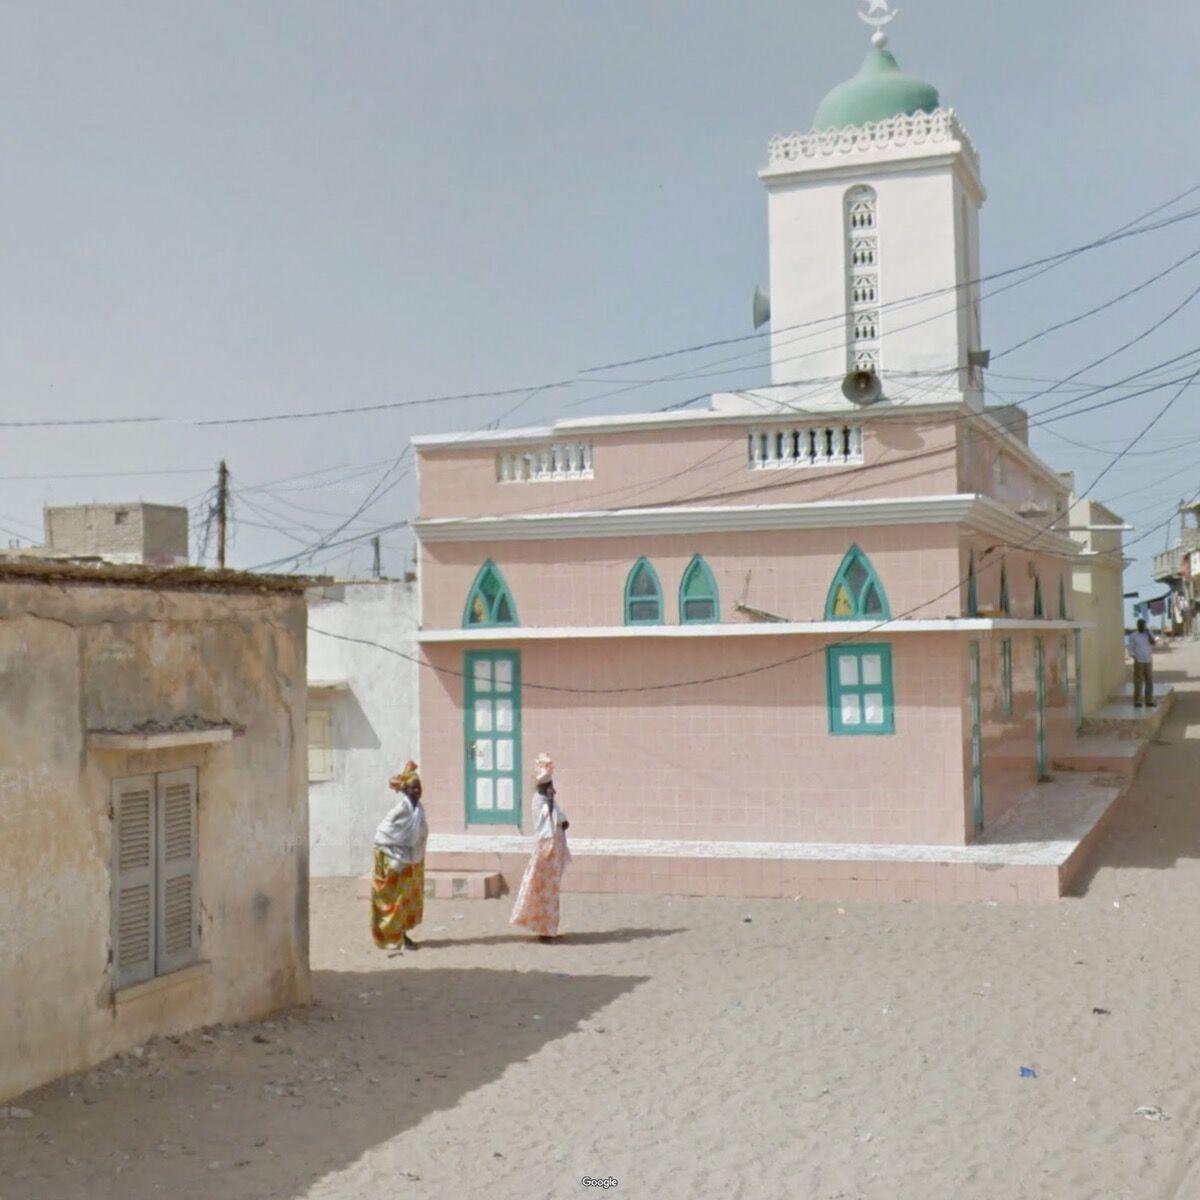 St. Louis, Senegal. Photograph by Jacqui Kenny via Google Street View.